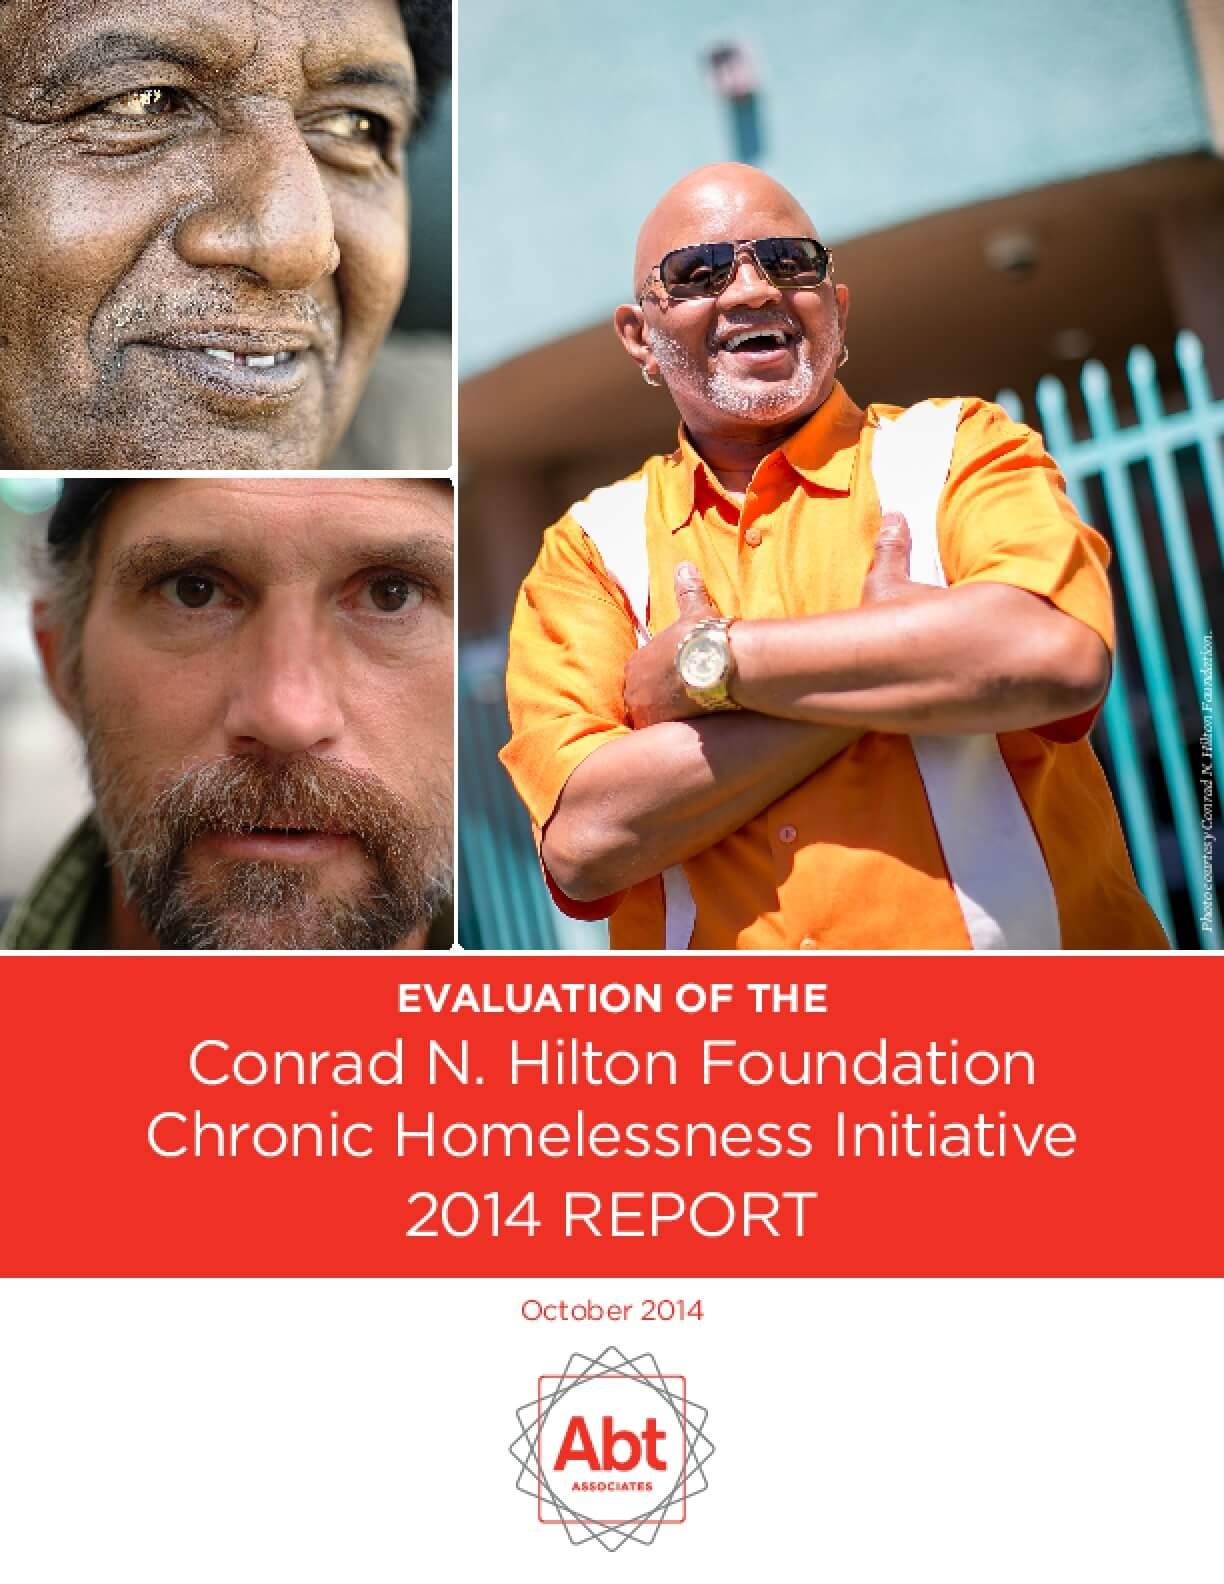 Evaluation of the Conrad N. Hilton Foundation Chronic Homelessness Initiative: 2014